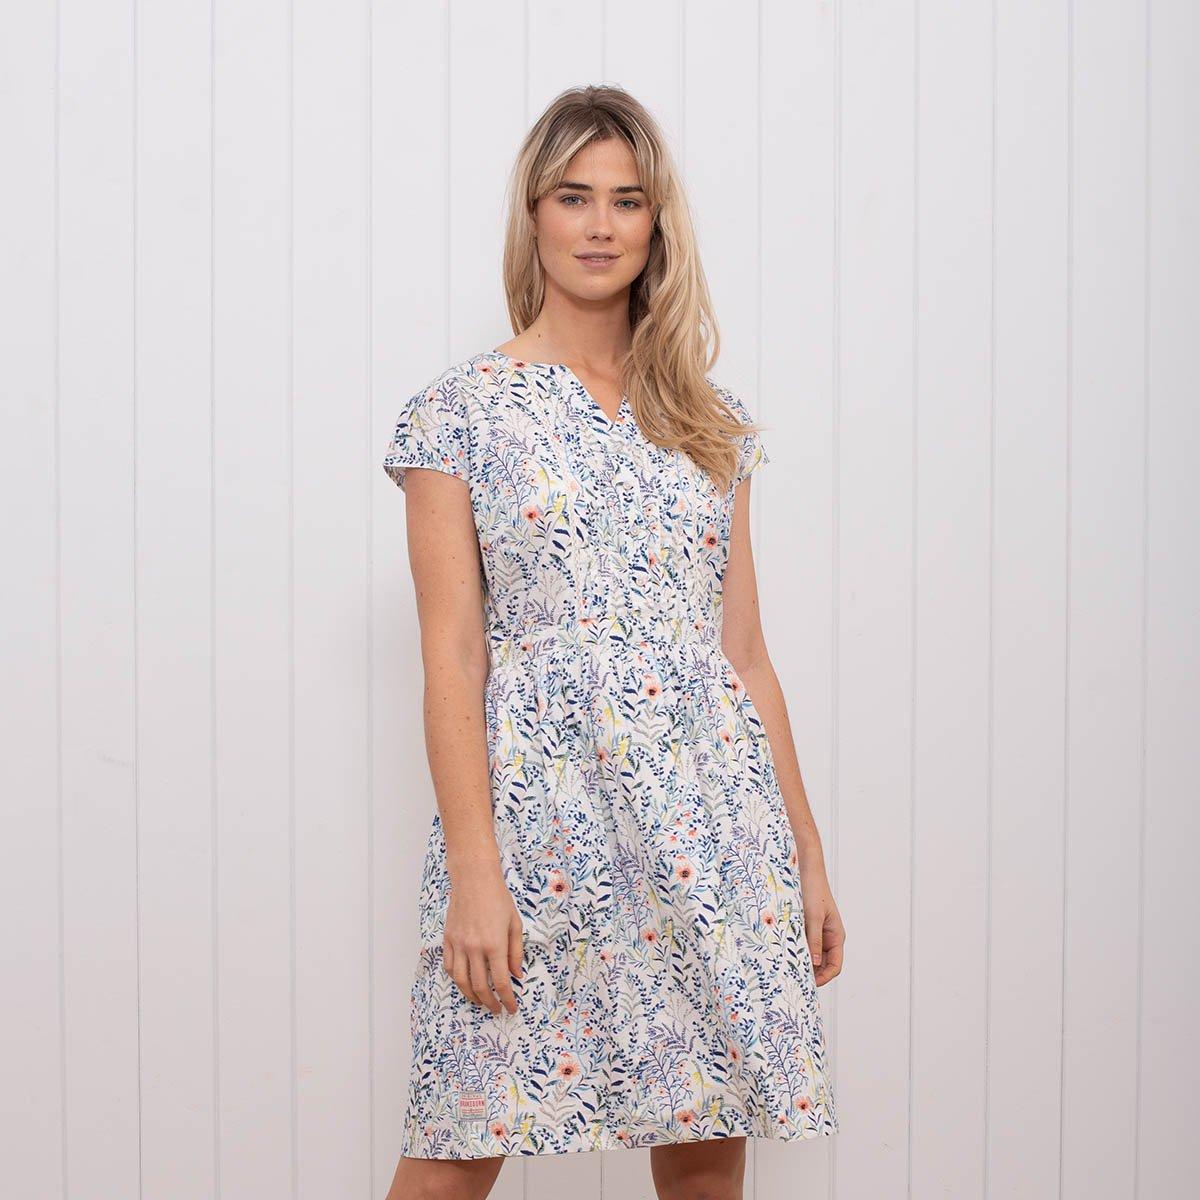 731f620e6eeb Brakeburn Biele letné šaty s potlačou kvetov - JoyStore.sk